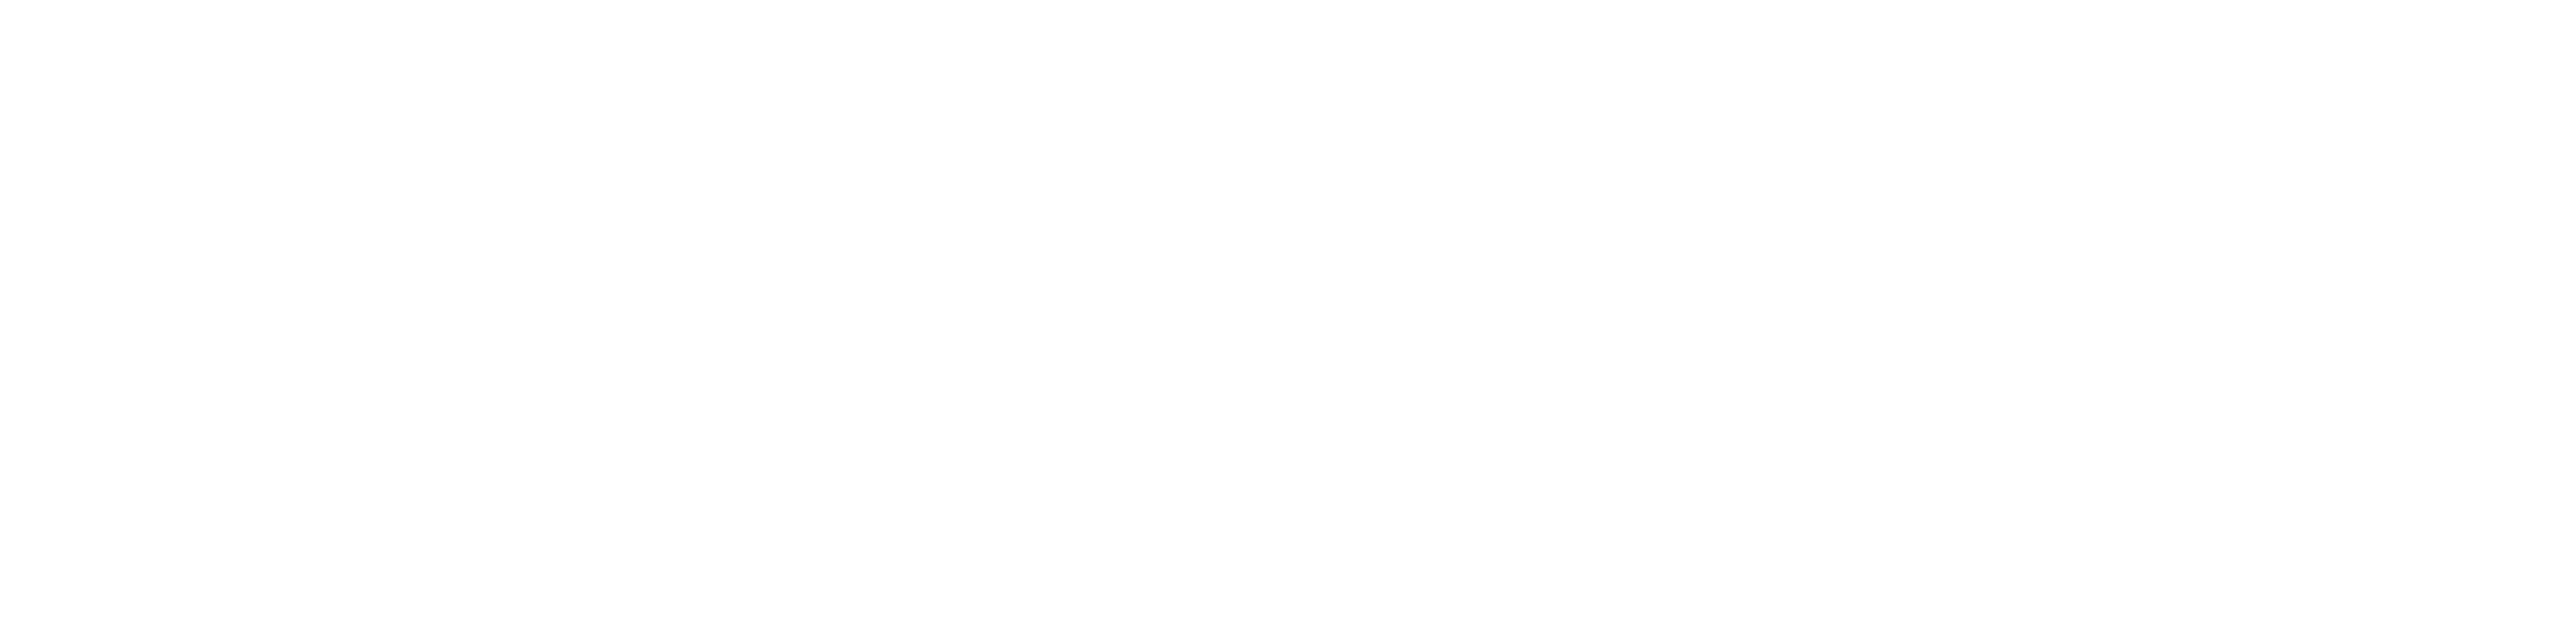 mobile-donation-process